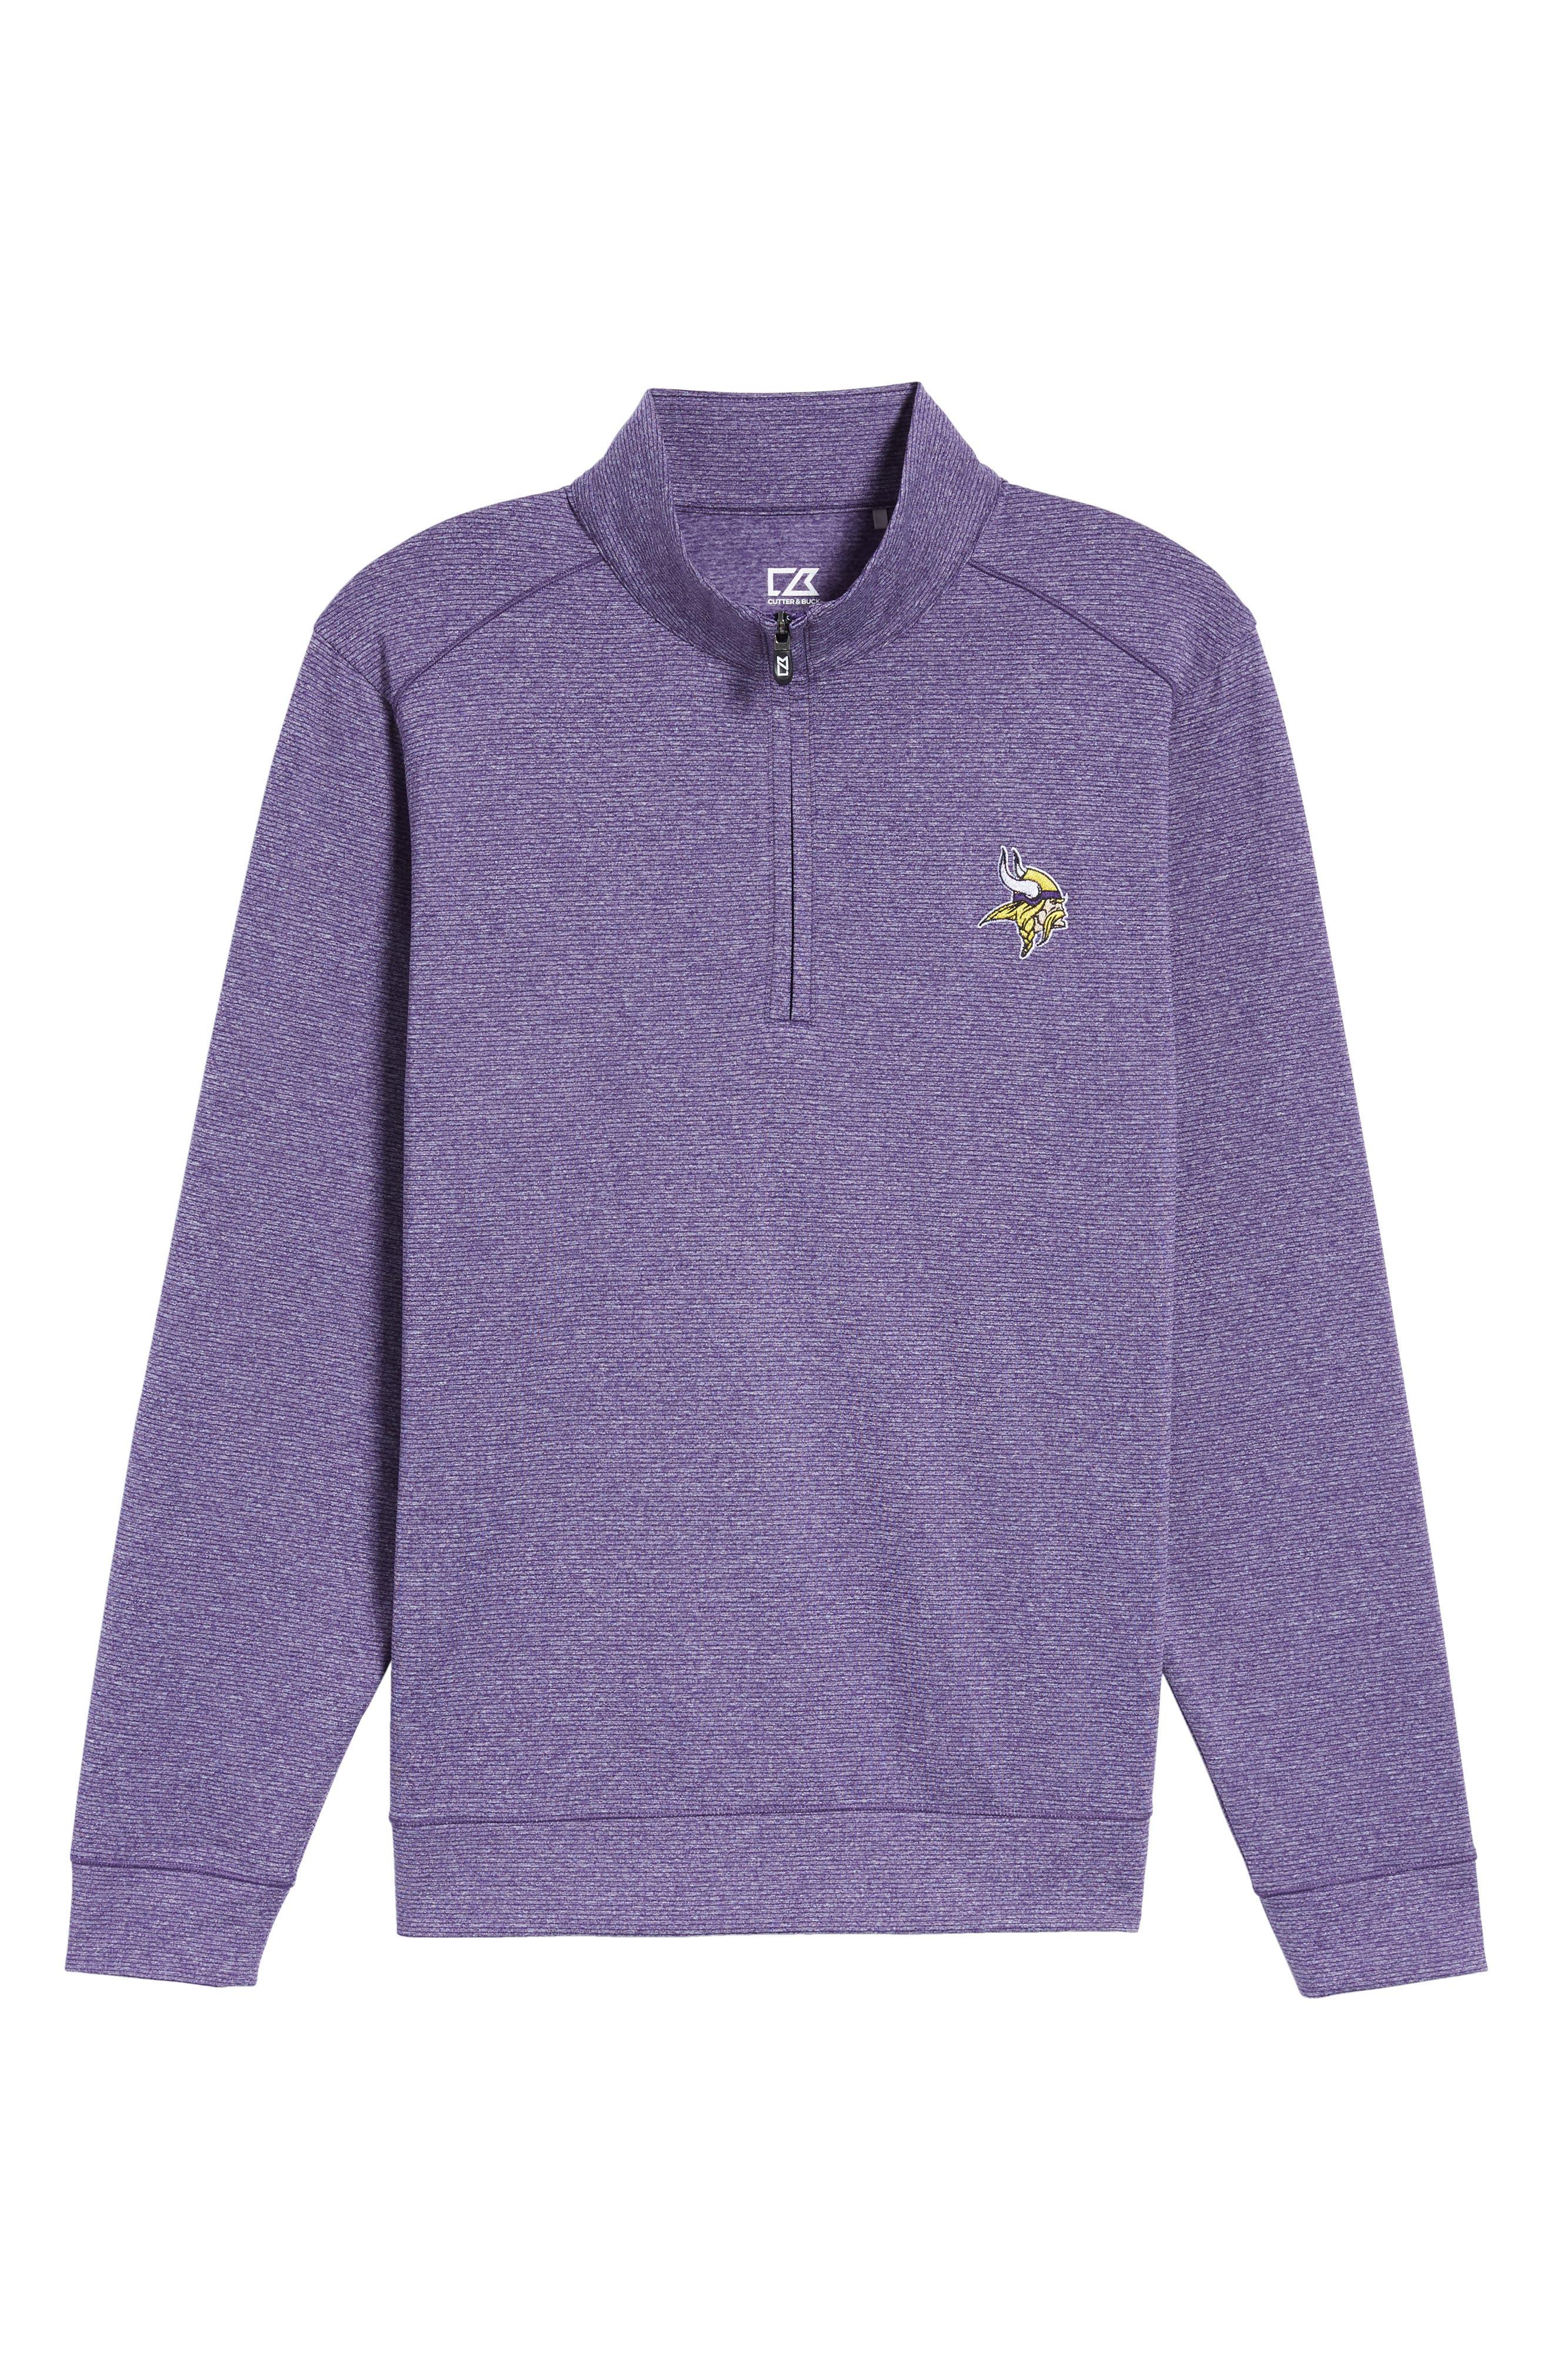 Shoreline - Minnesota Vikings Half Zip Pullover,                             Alternate thumbnail 6, color,                             513